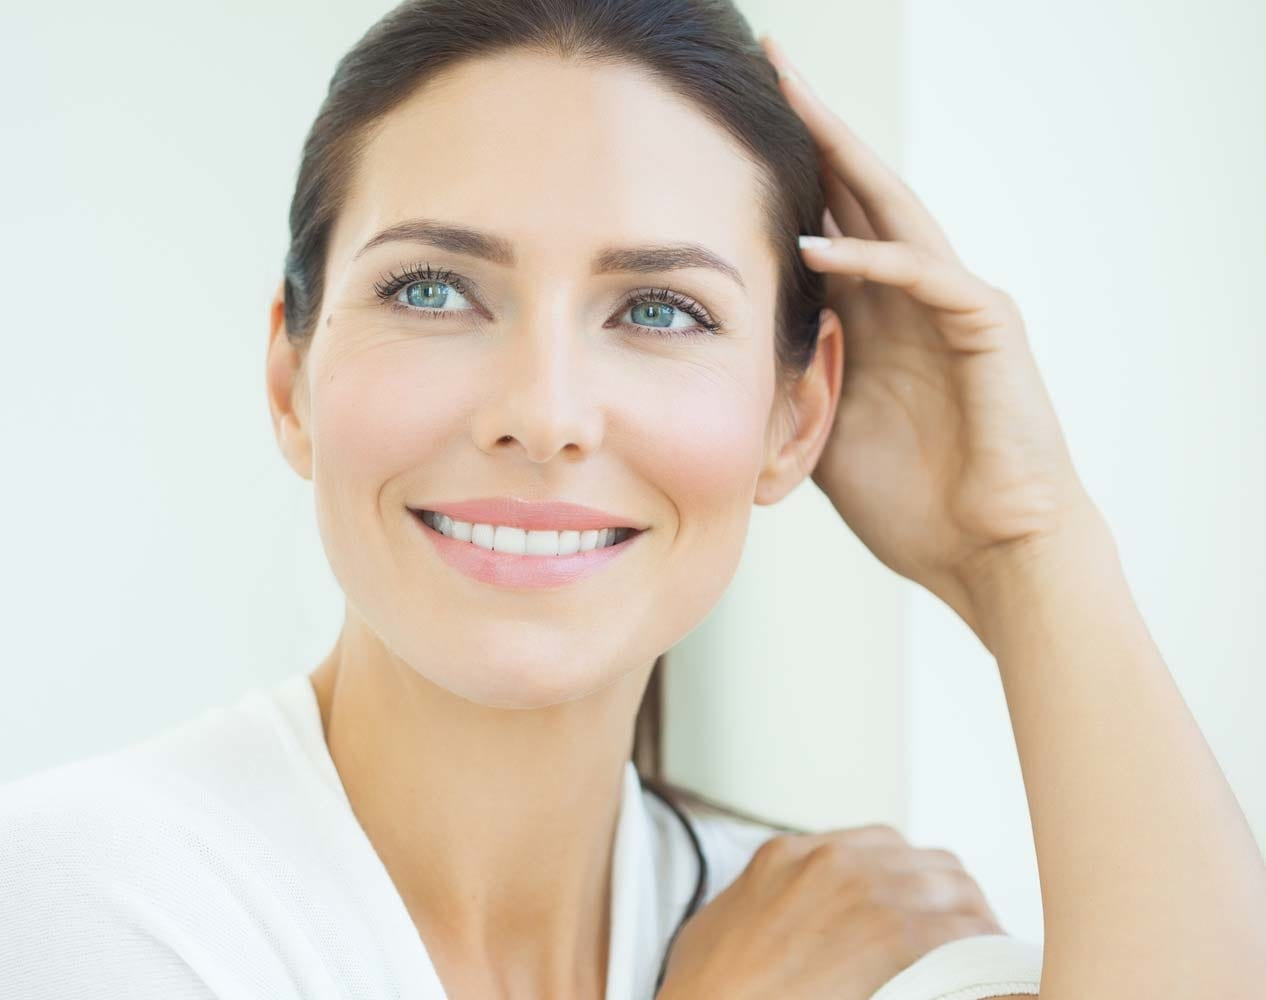 Trikwan - Obagi Skin Care Systems